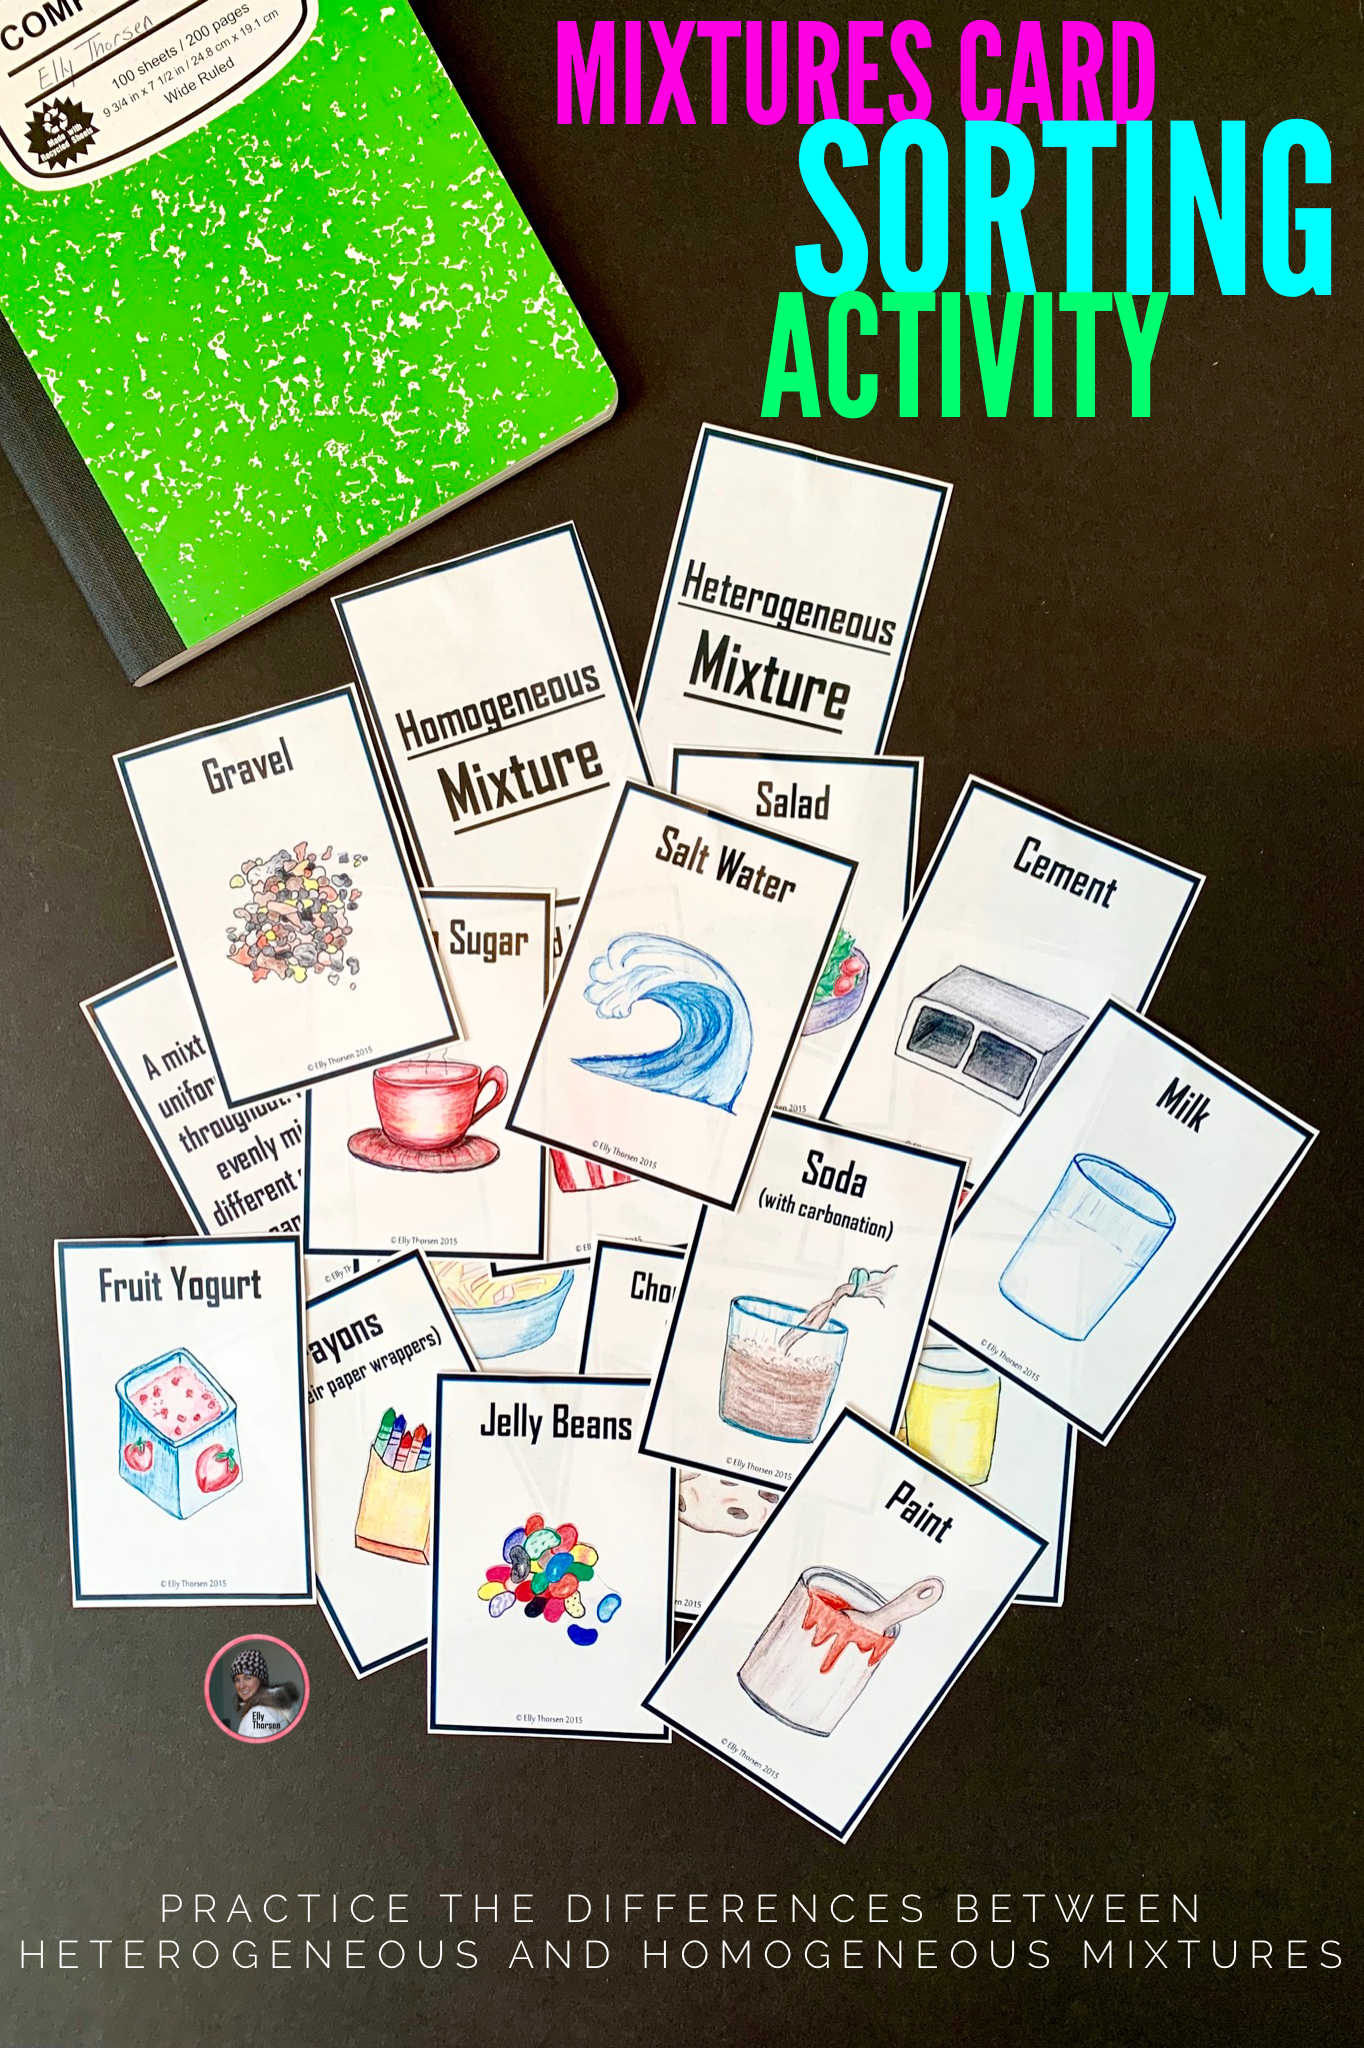 Homogeneous And Heterogeneous Mixtures Card Sorting